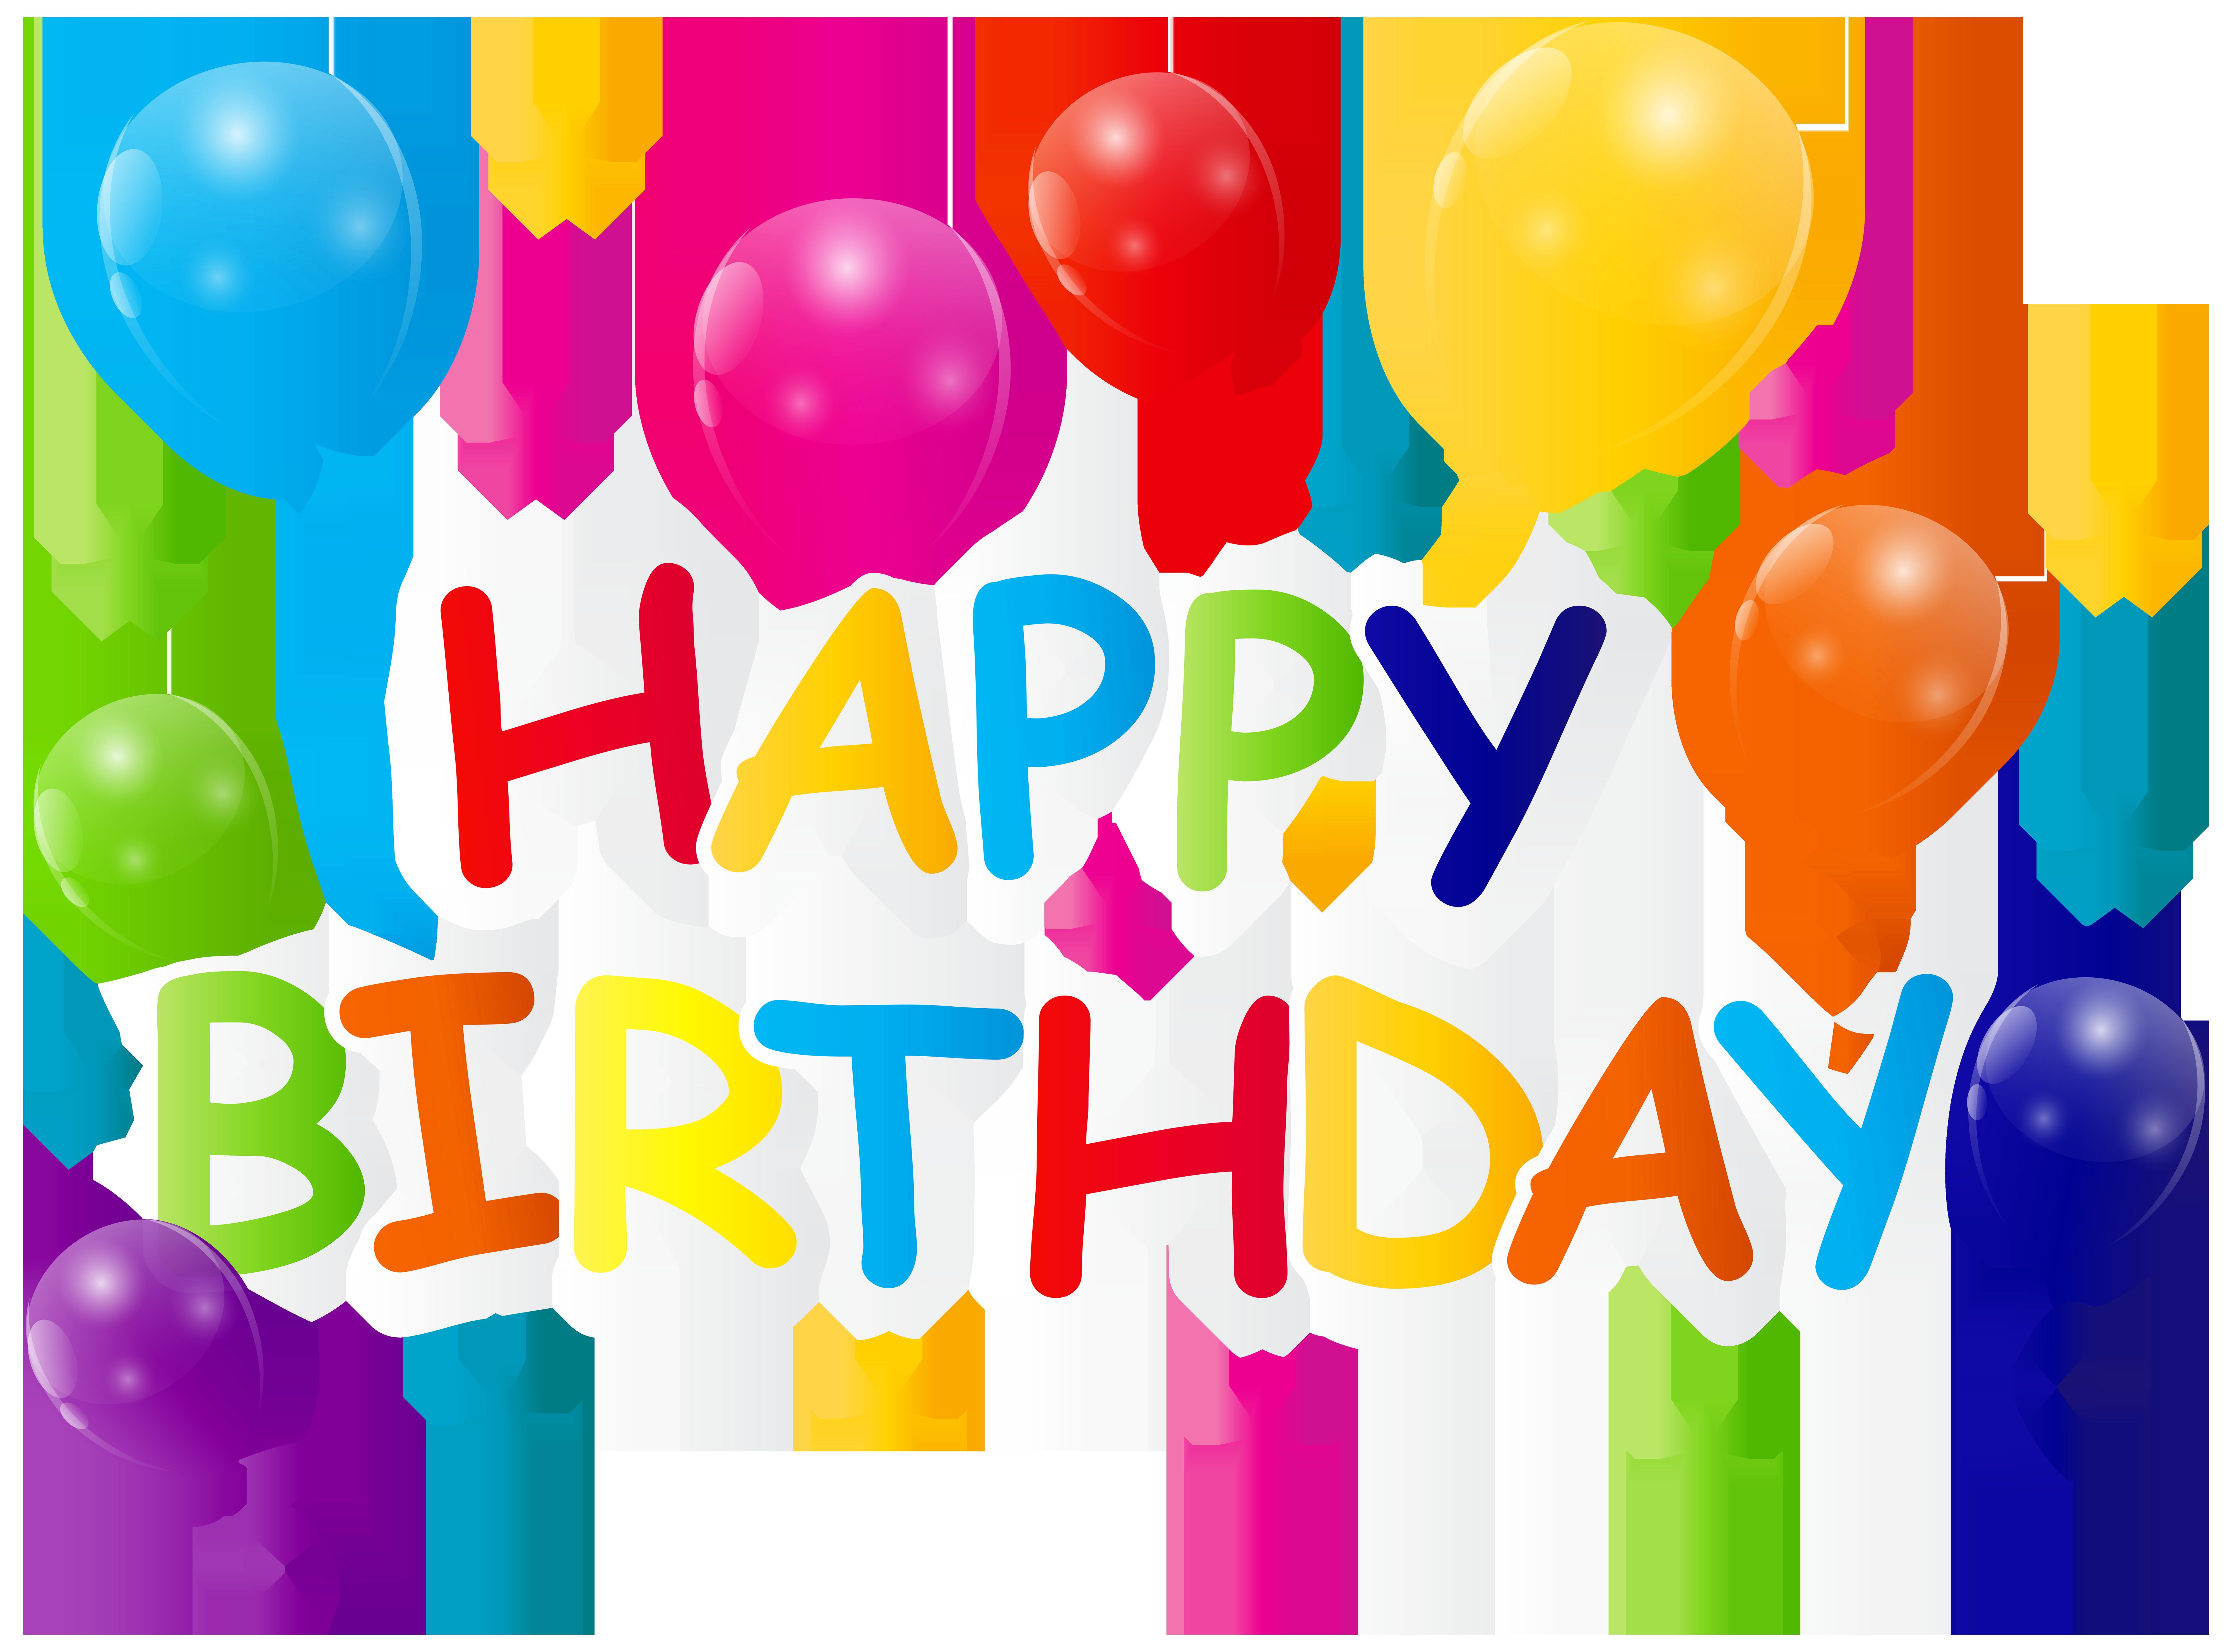 Happy Birthday Clip Art Png Image Happy Birthday Clip Art Happy Birthday Png Happy Birthday Clip